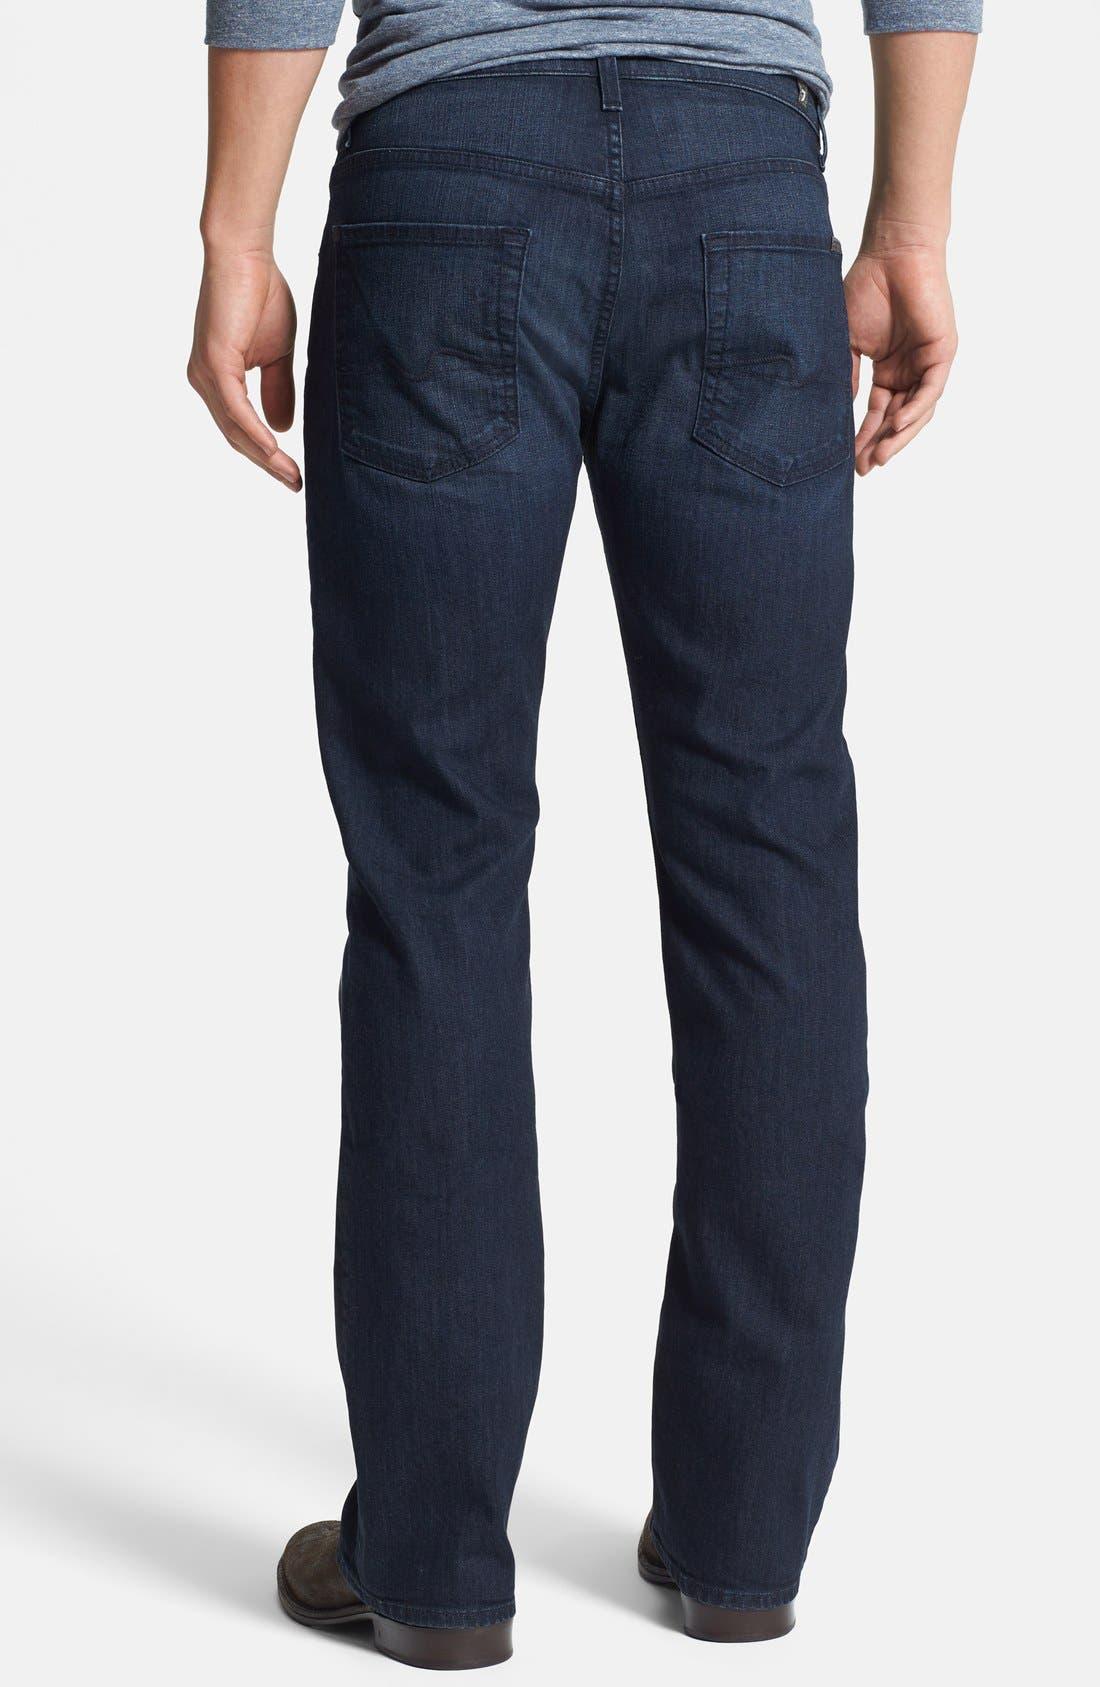 Alternate Image 2  - 7 For All Mankind® 'Brett' Bootcut Jeans (Sunset Hill Blue) (Online Only)